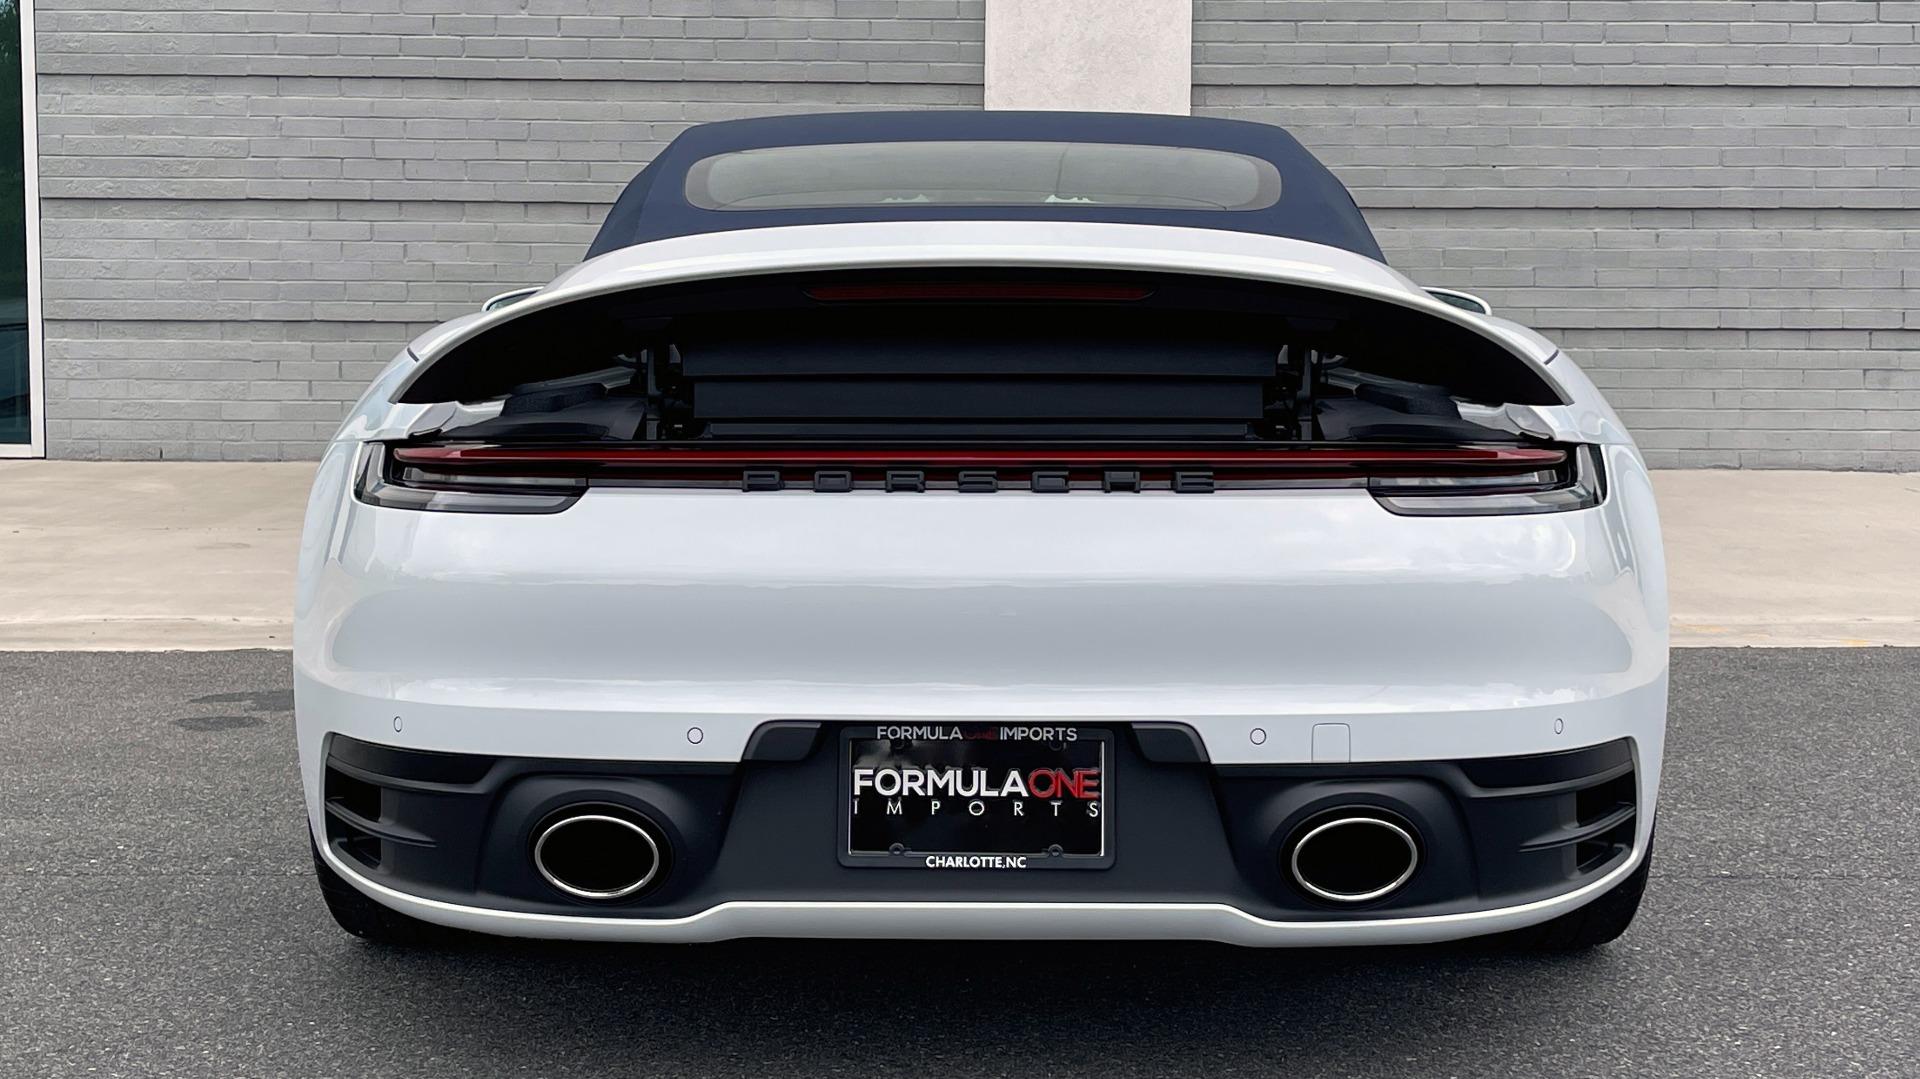 Used 2020 Porsche 911 CARRERA 4S CABRIOLET PREMIUM SPORT PKG / NAV / BOSE / LIGHT DESIGN PKG for sale $167,595 at Formula Imports in Charlotte NC 28227 32